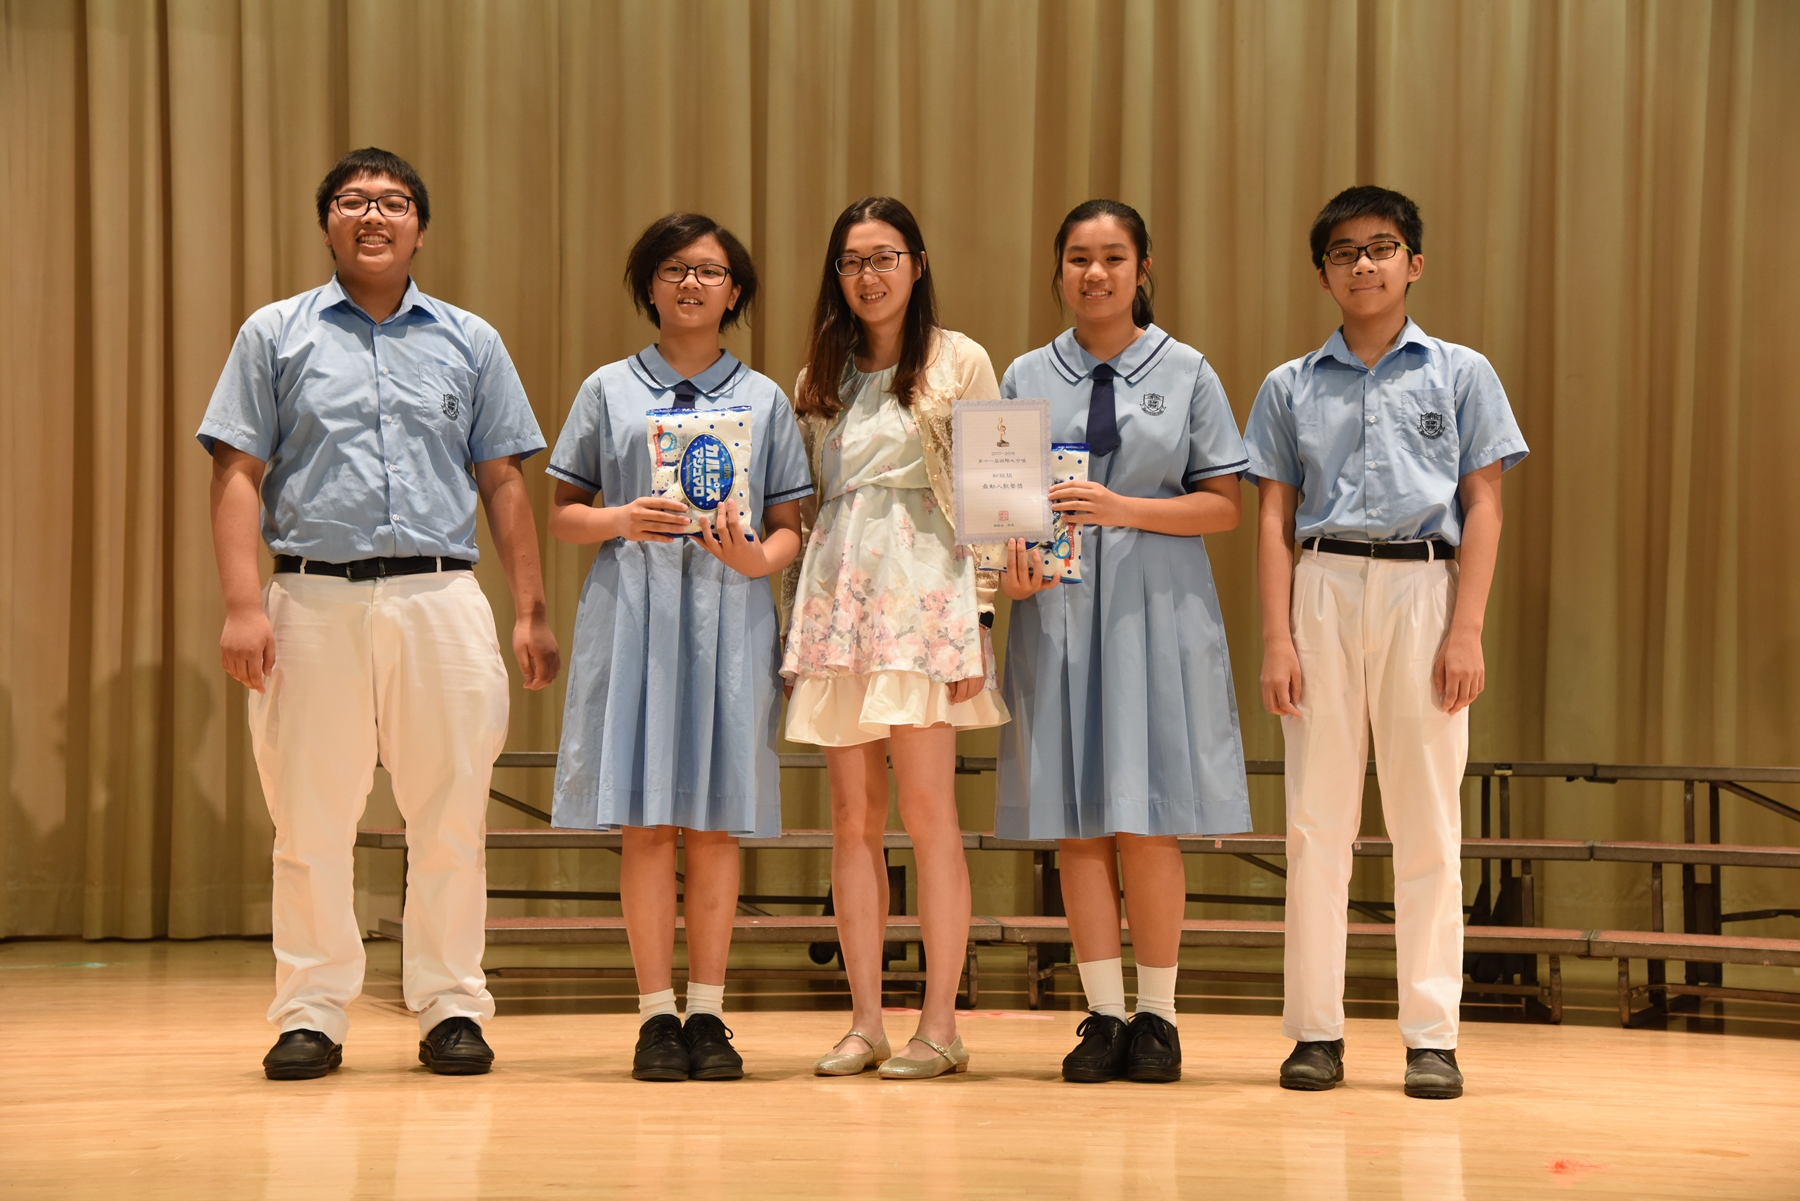 http://npc.edu.hk/sites/default/files/dsc_3389.jpg